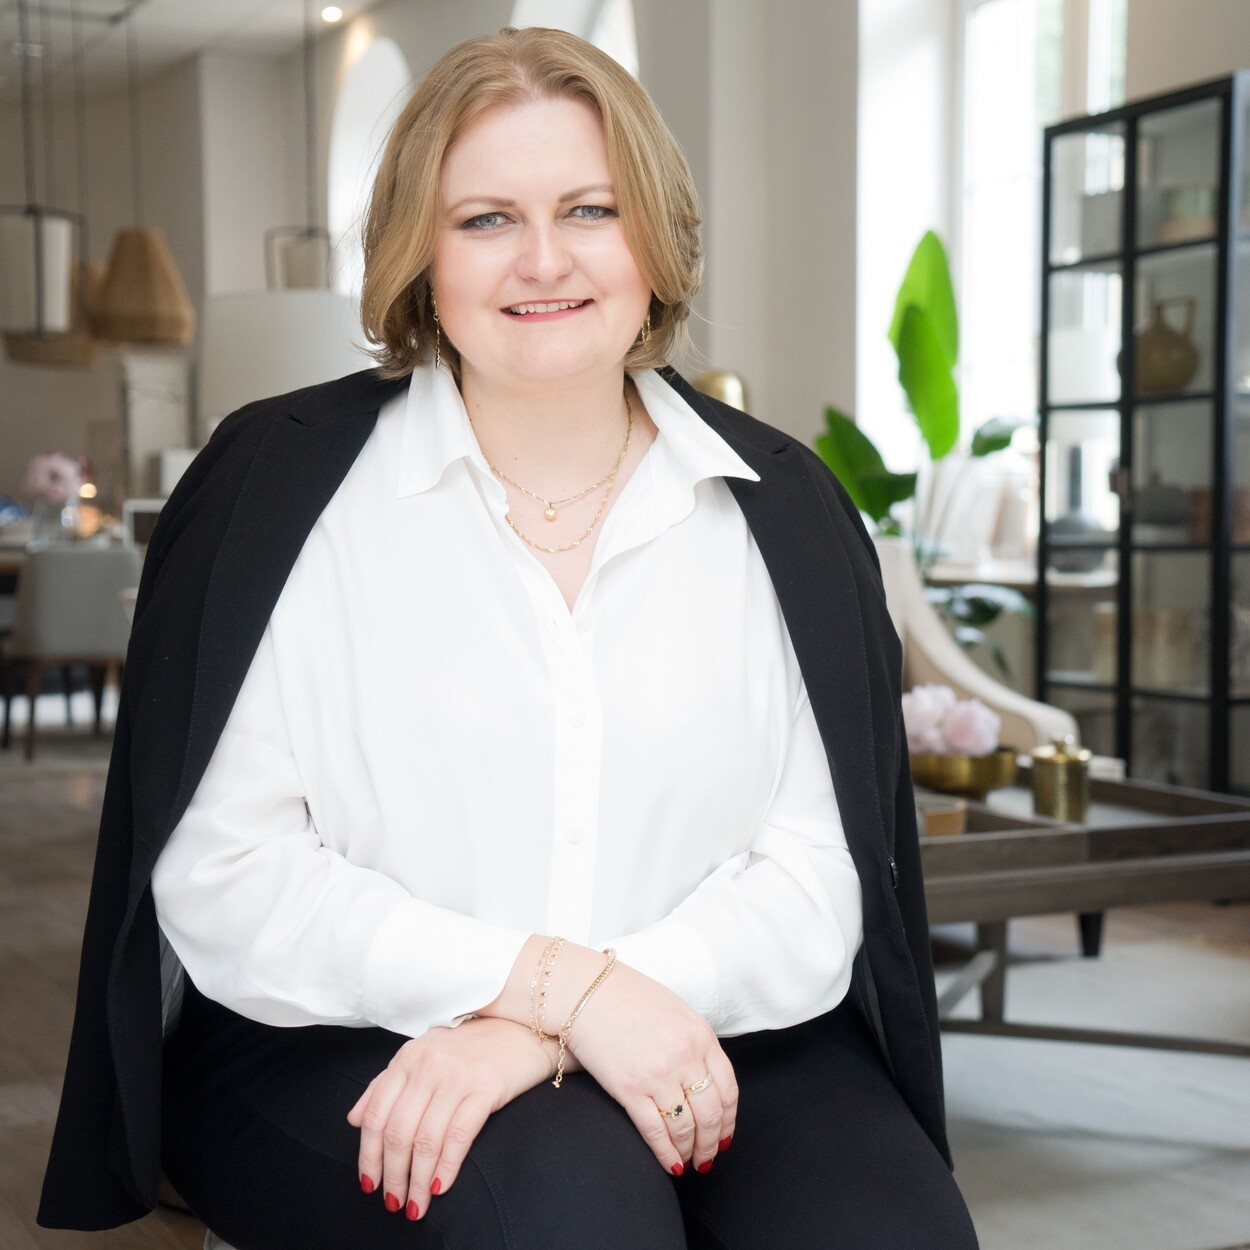 Justyna Kopeć marka osobista